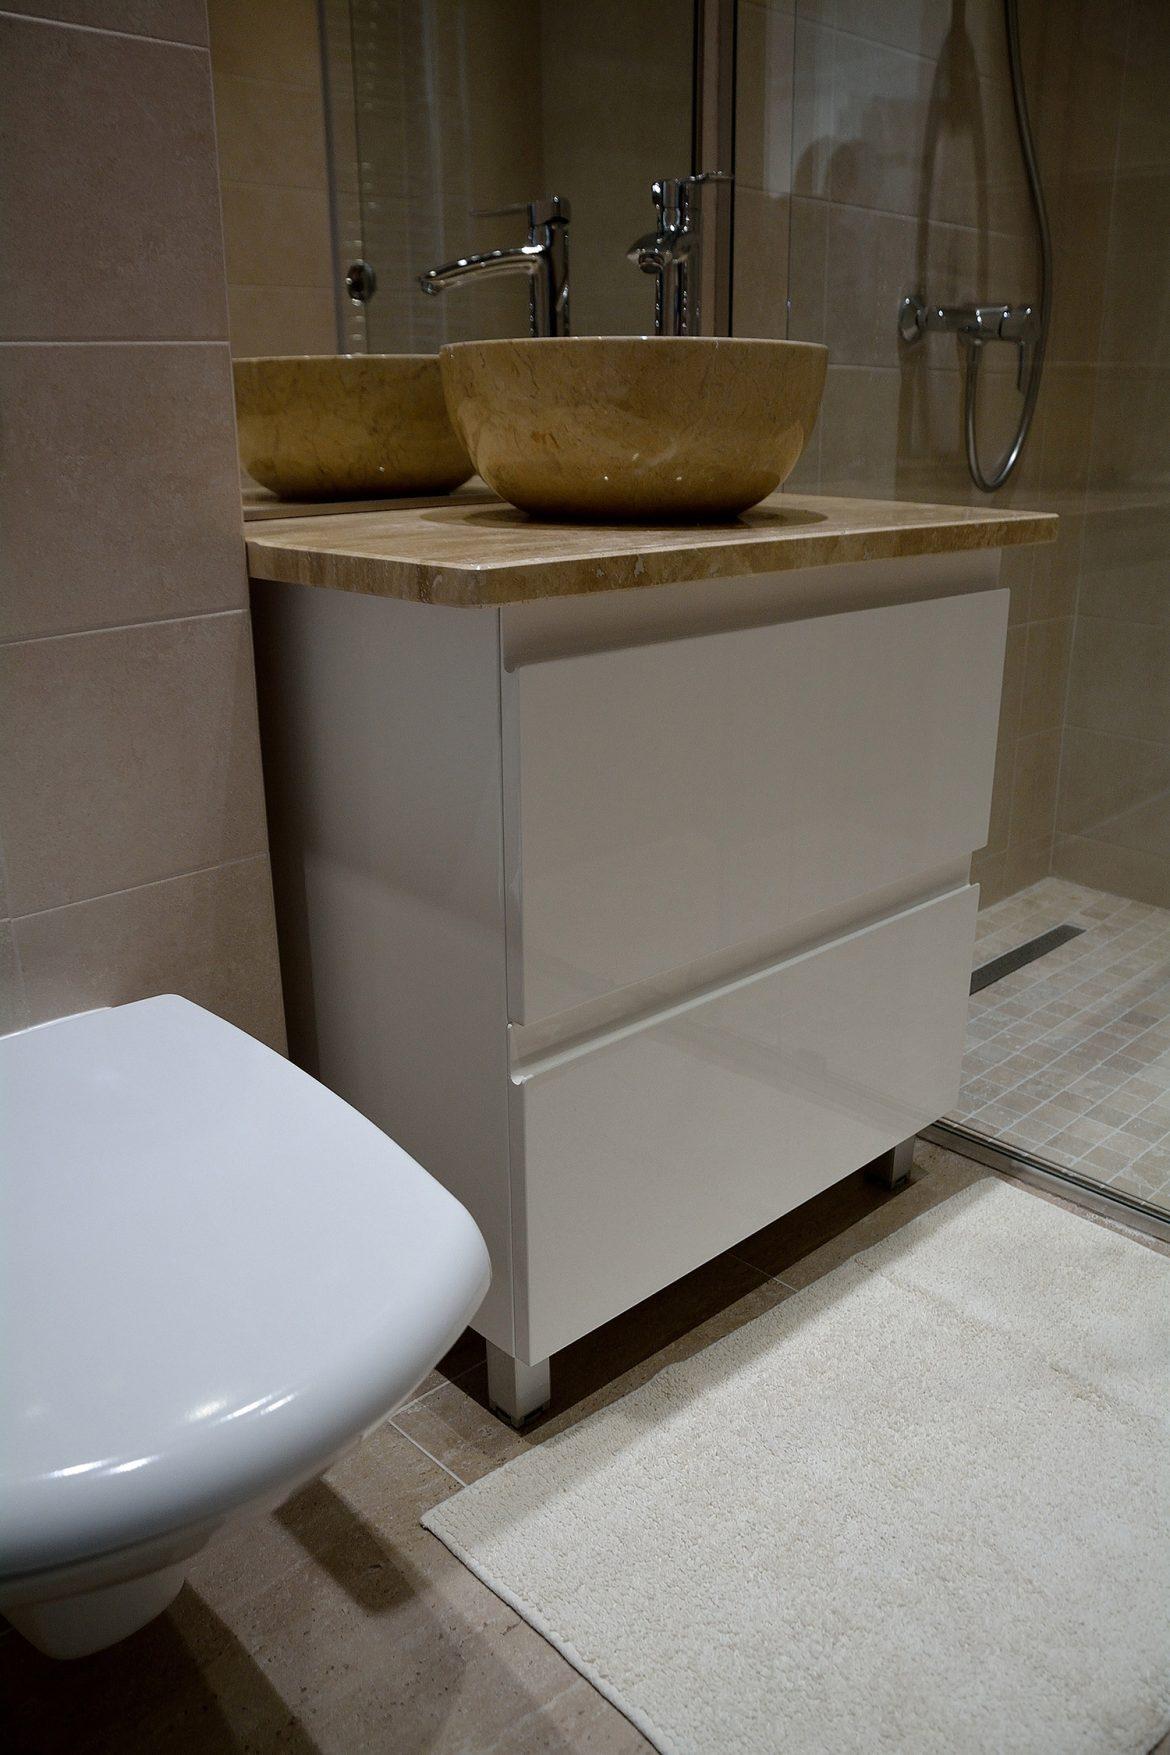 Corp baie mobilier realizat in intregime din Mdf Vopsit Lucios Alb RAL 9003 cu blat din granit crem